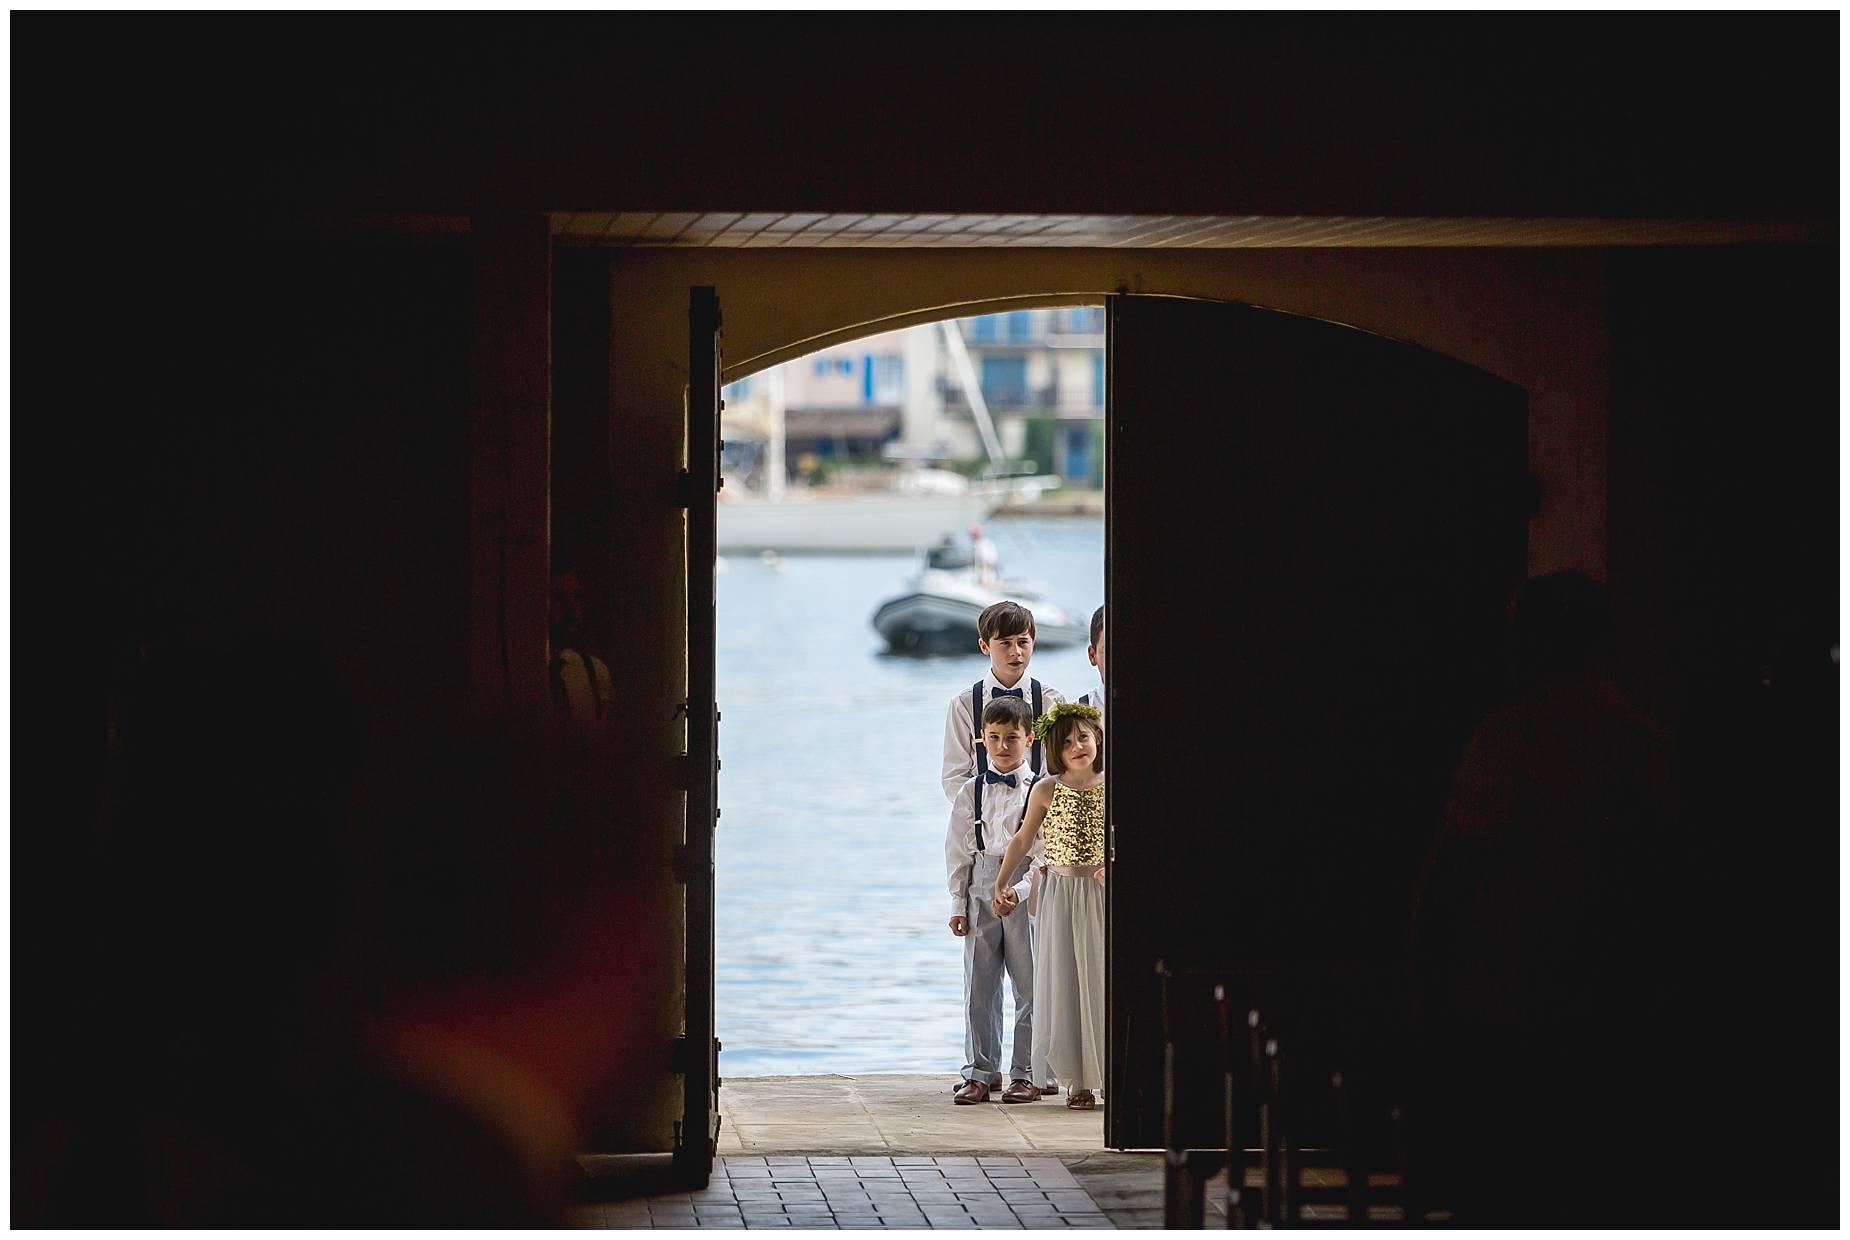 Port Grimaud Wedding kids waiting to go inside the church